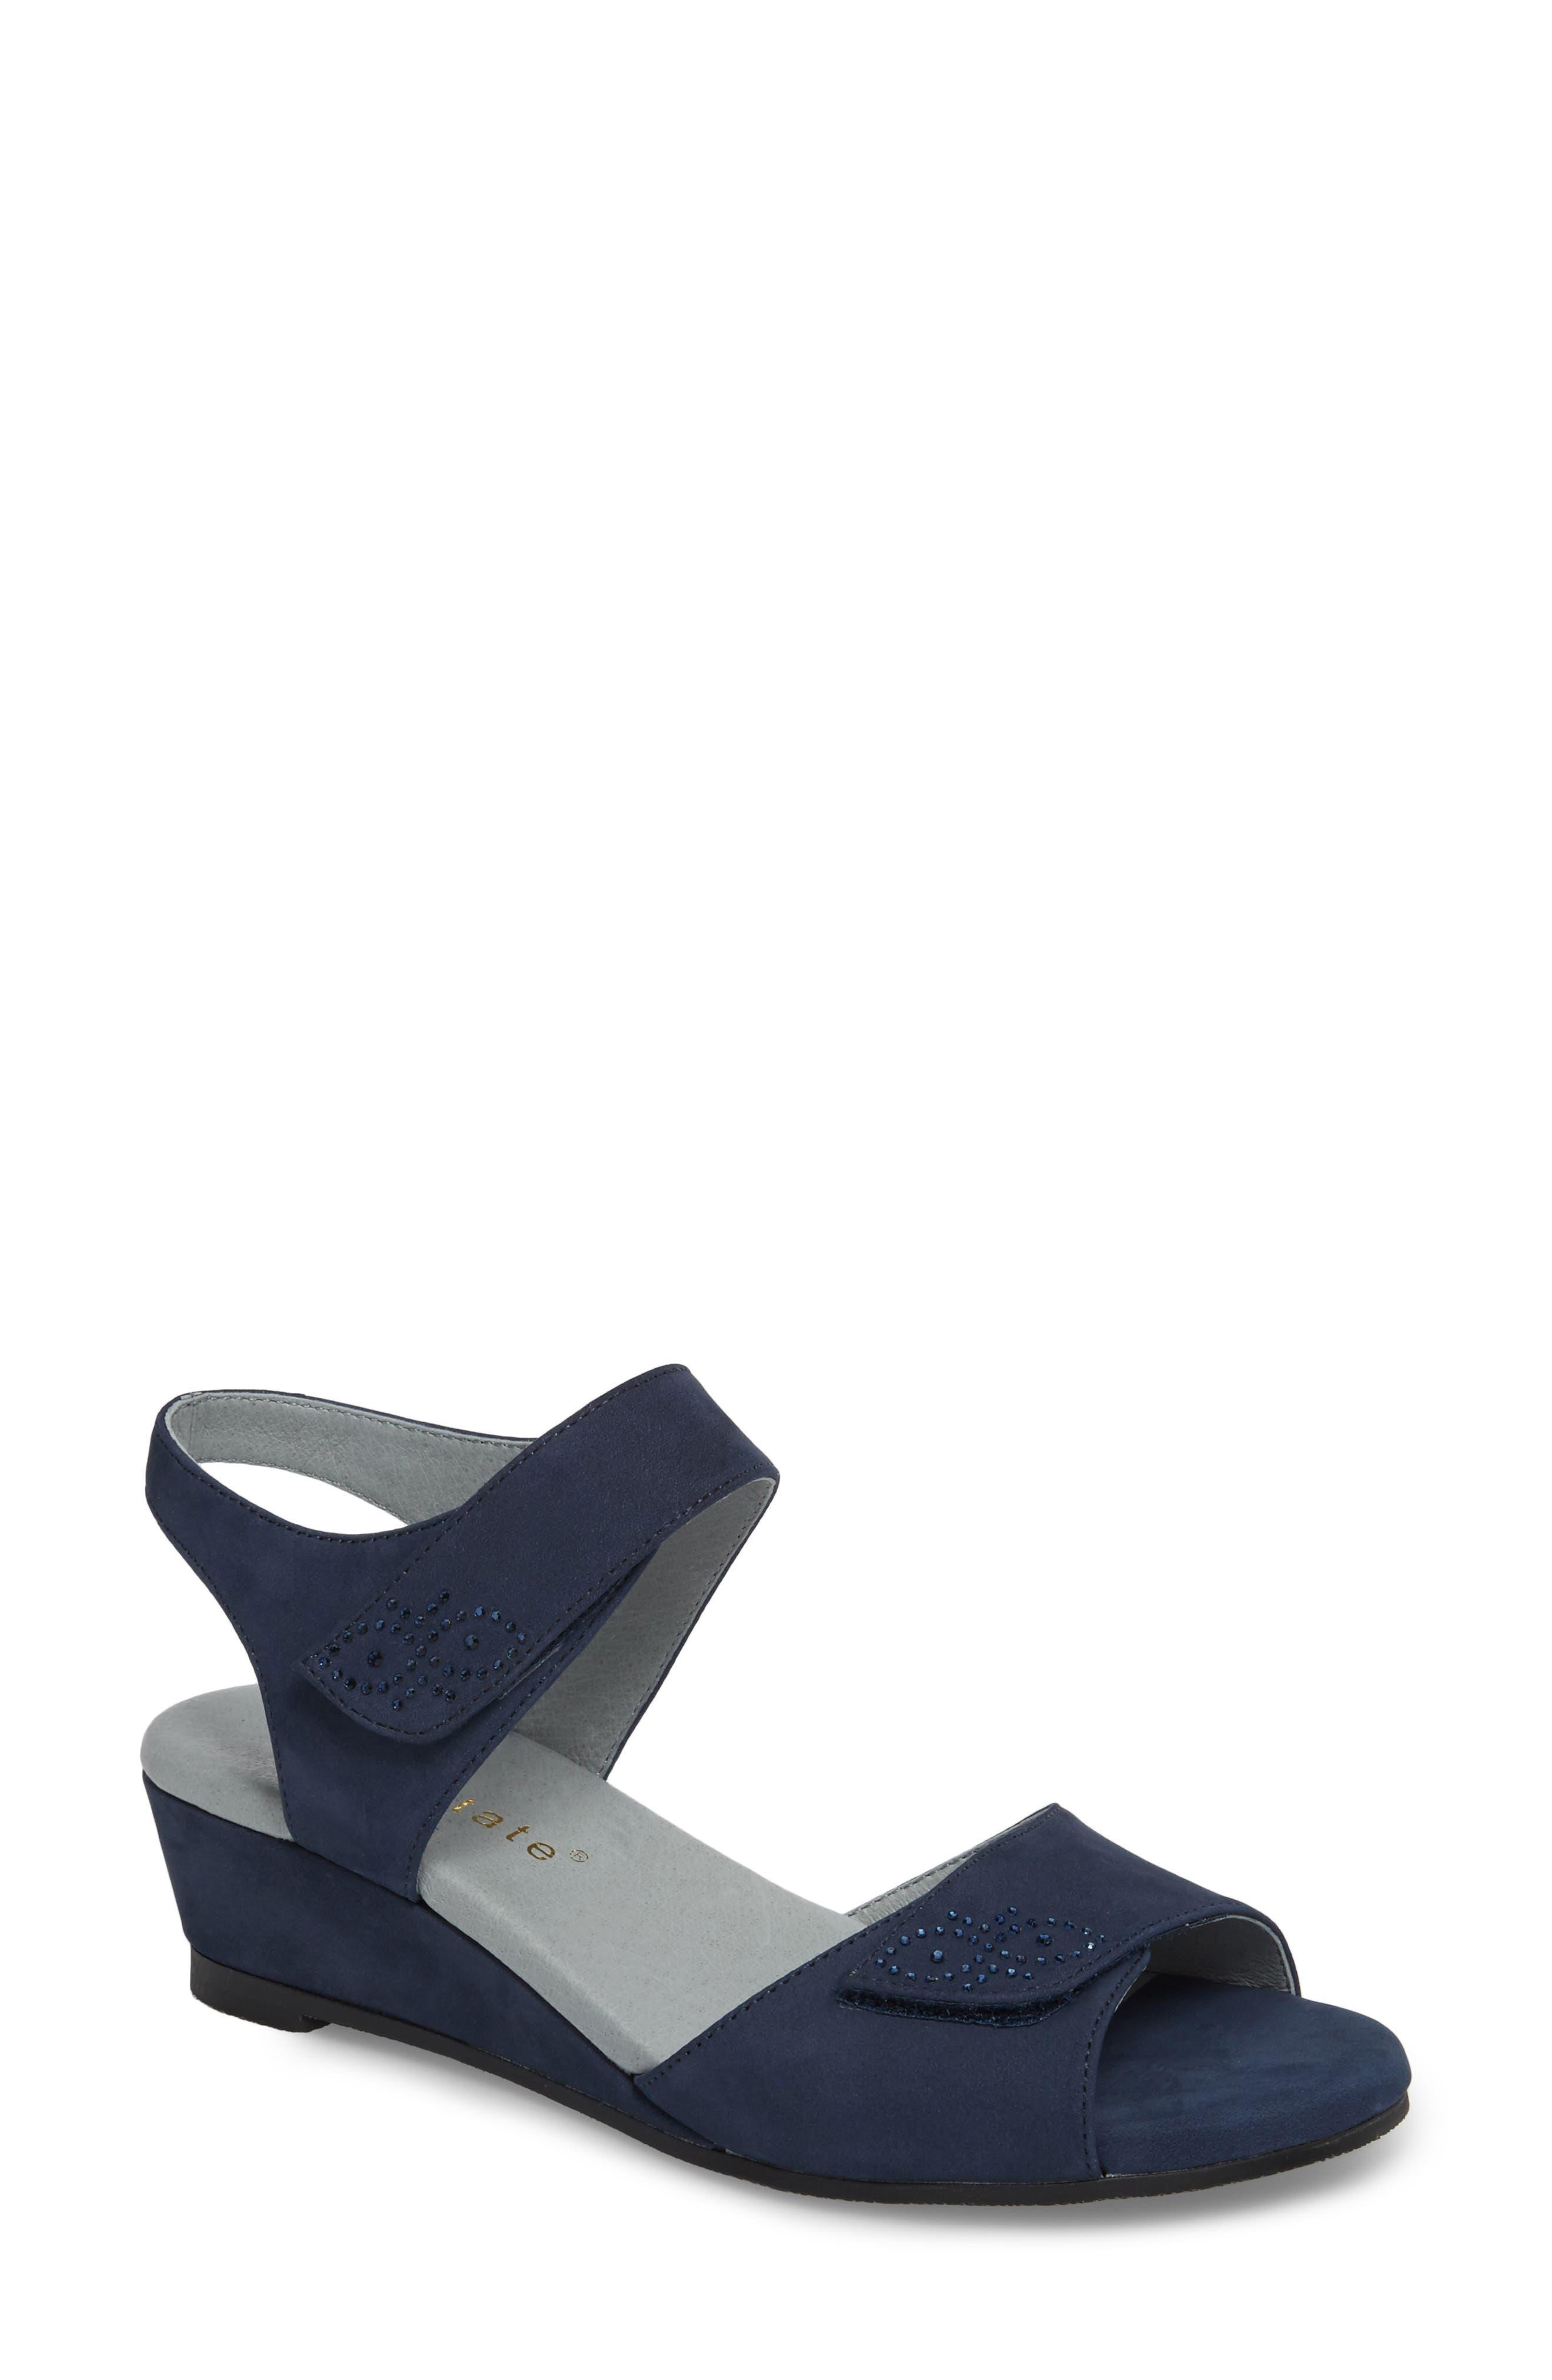 David Tate Queen Embellished Wedge Sandal (Women)